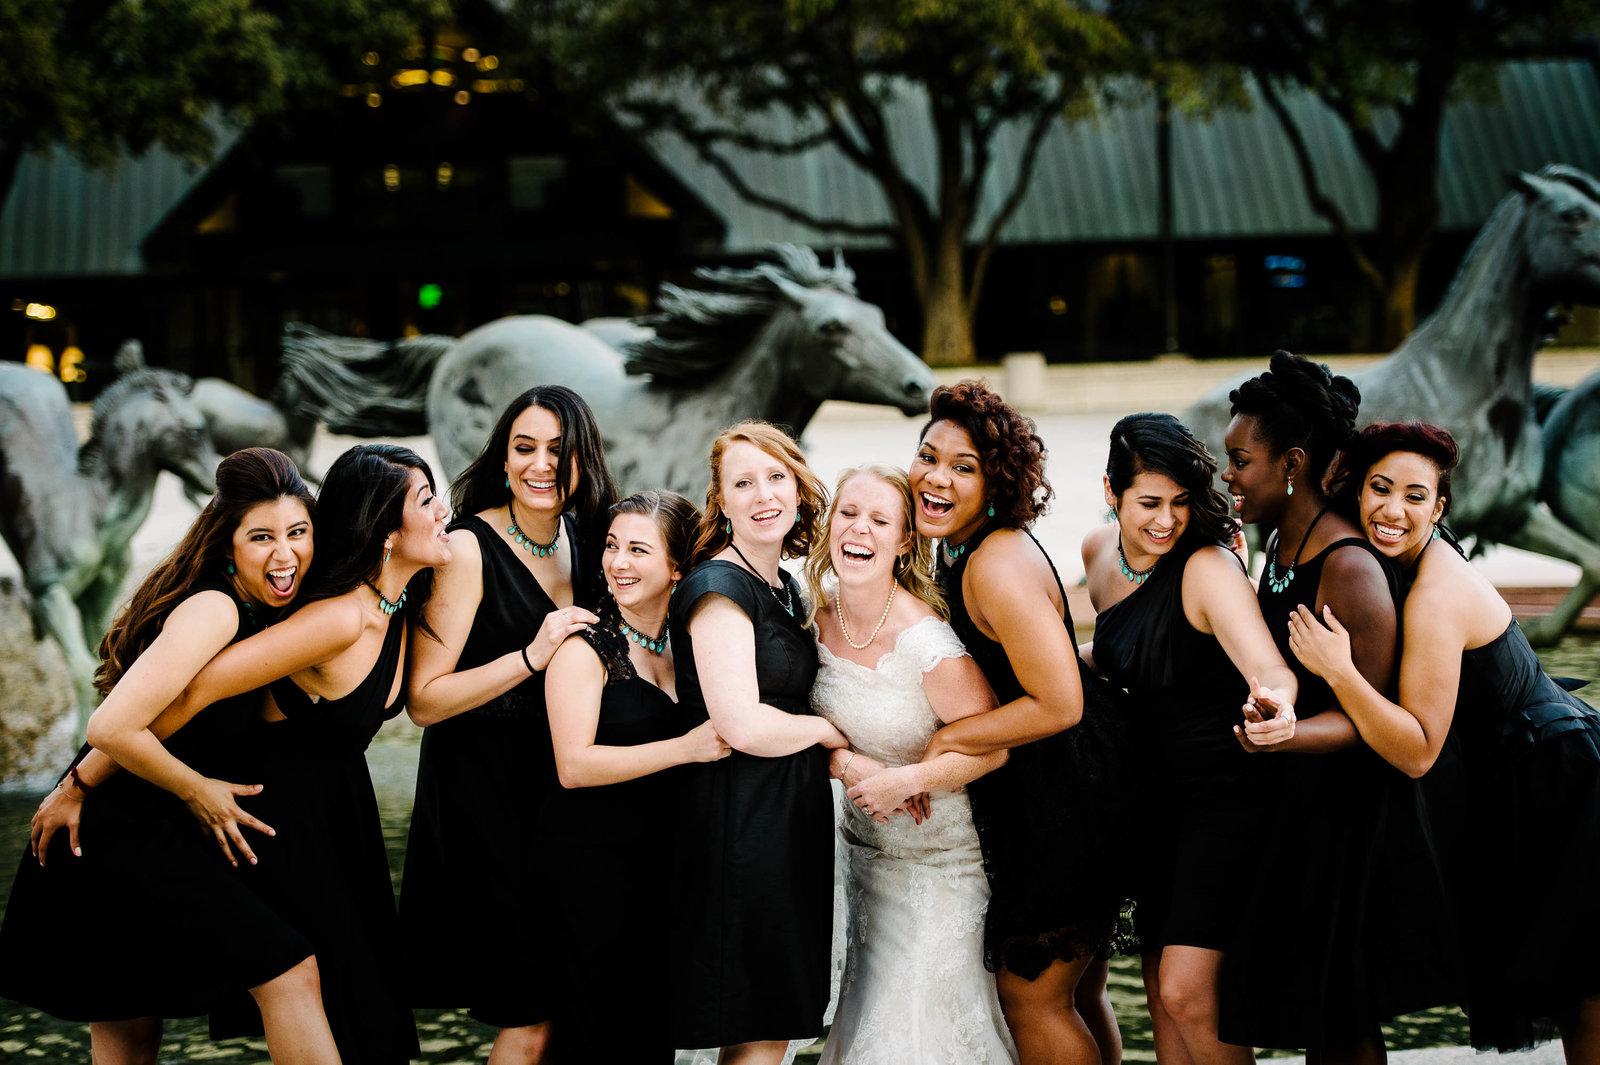 152-El-paso-wedding-photographer-El Paso Wedding Photographer_M39